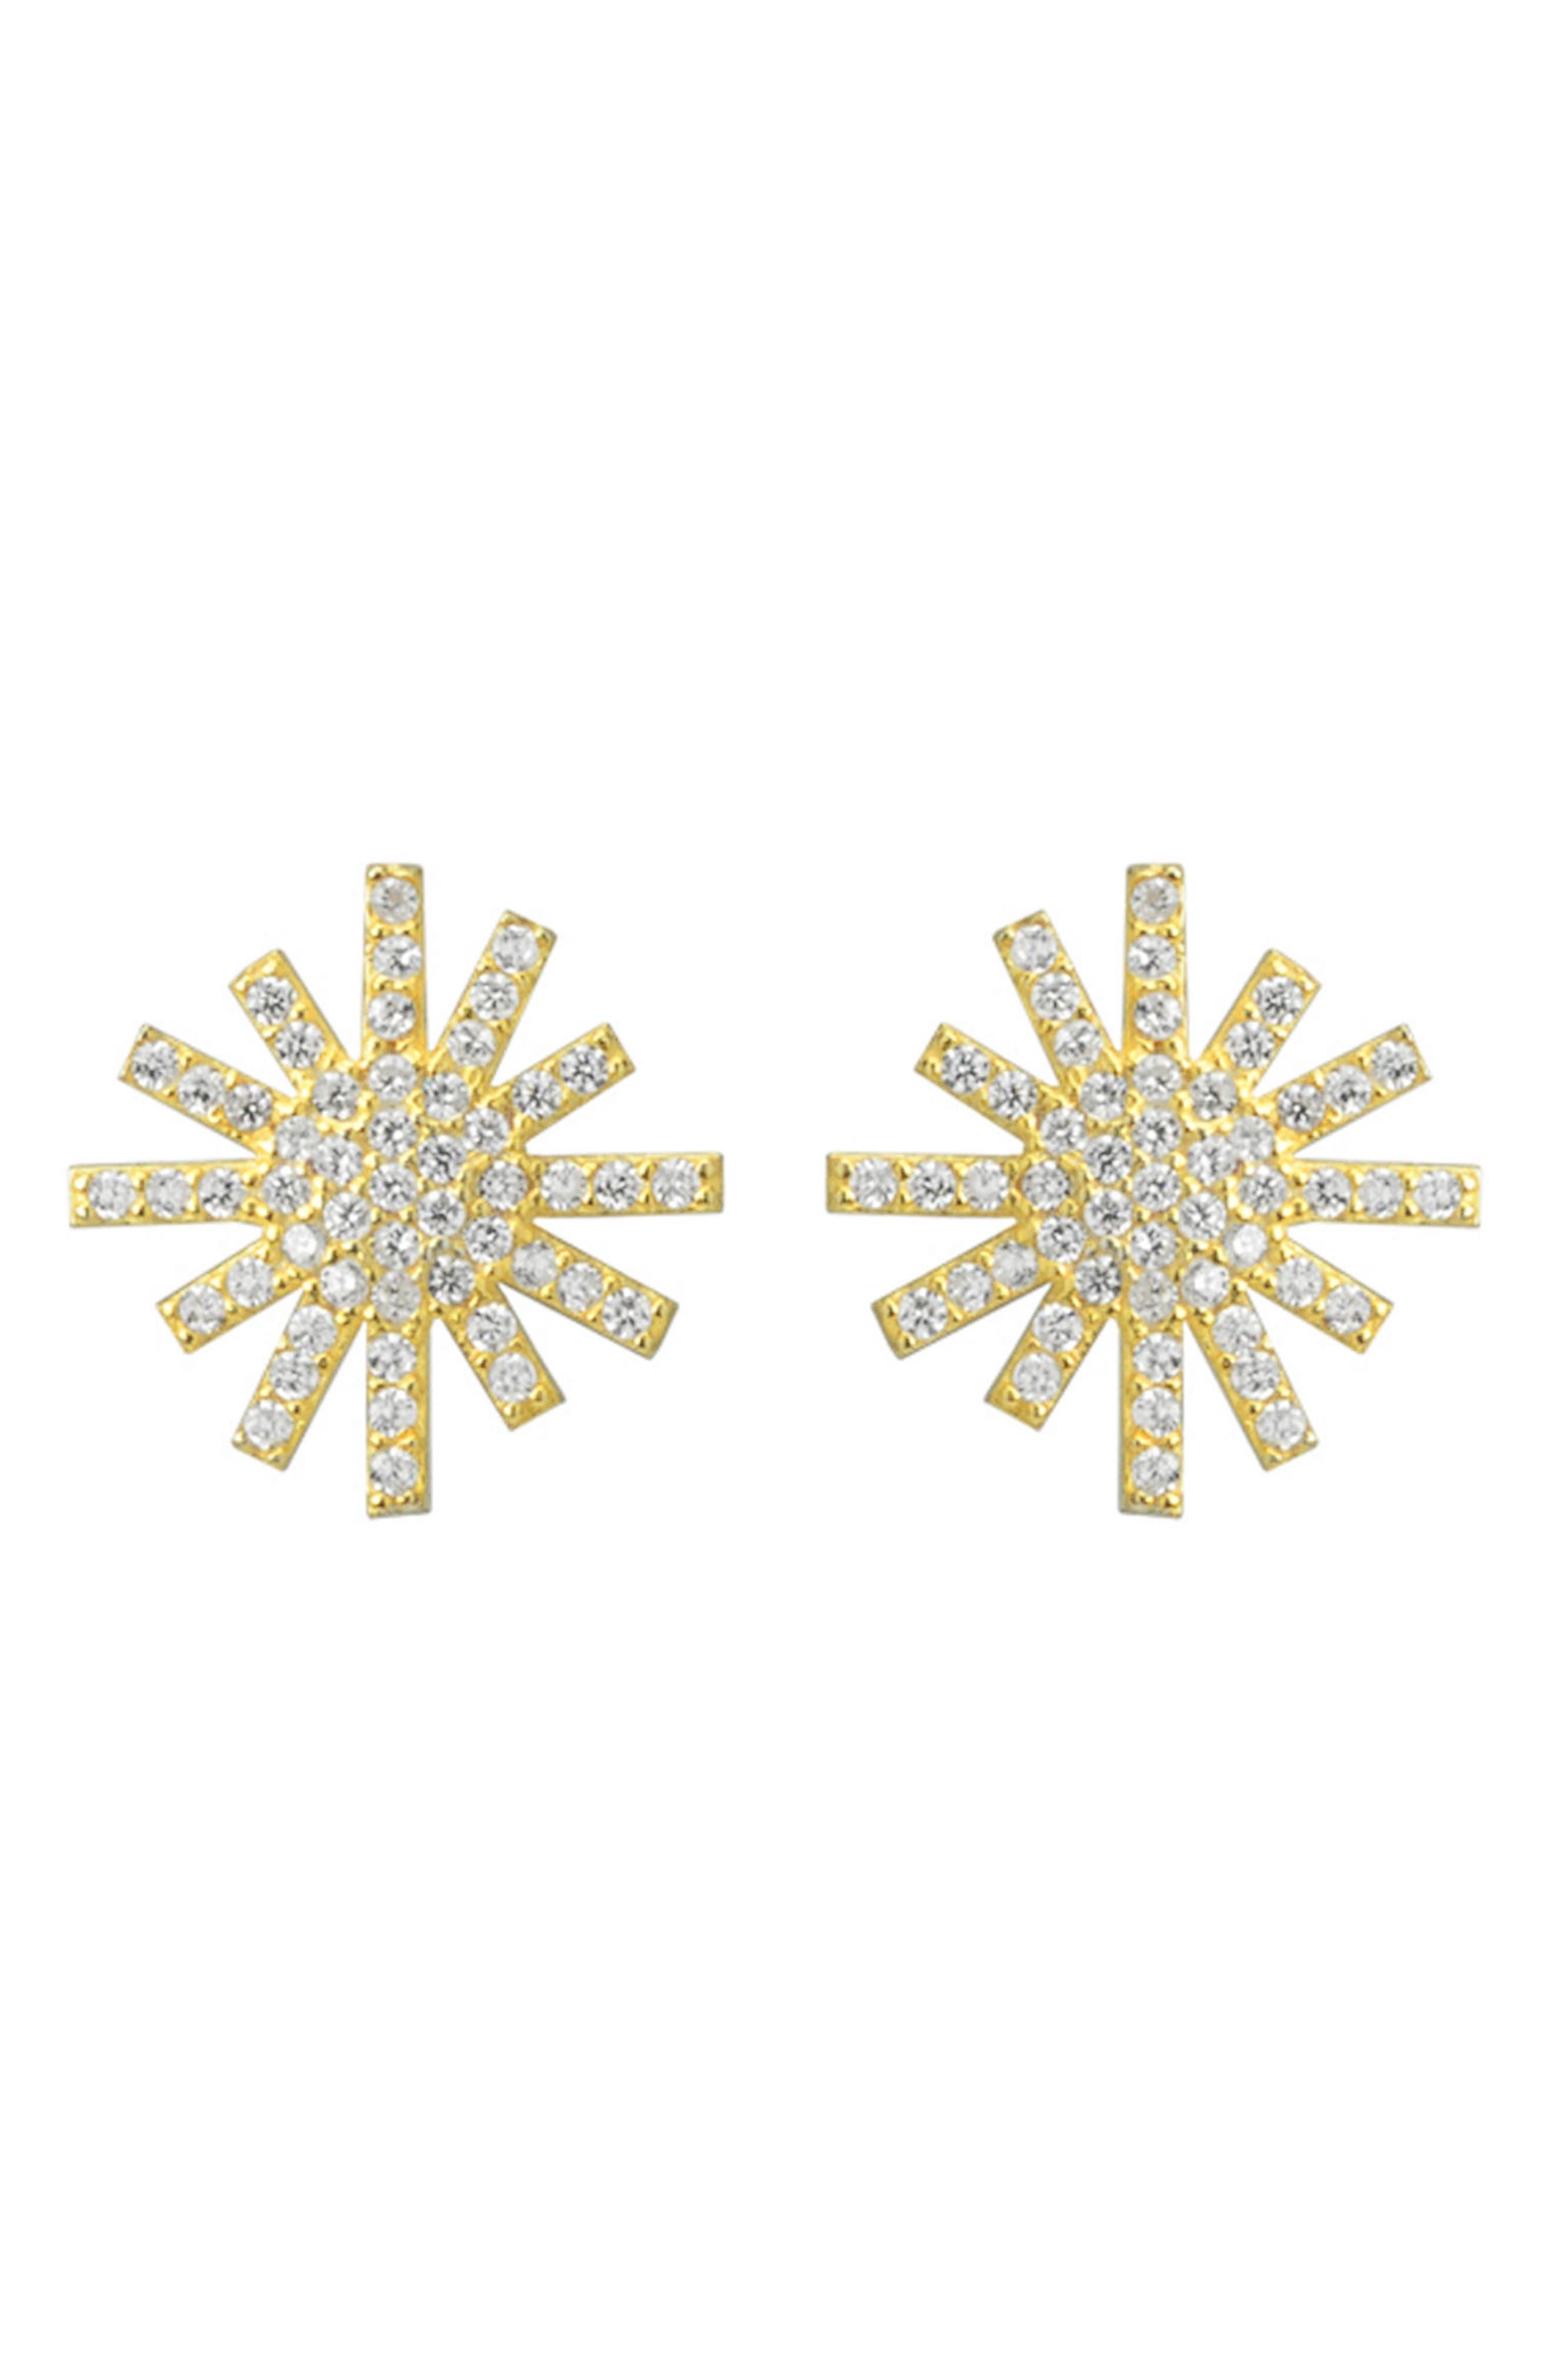 Starburst Stud Earrings,                             Main thumbnail 1, color,                             Metallic Gold